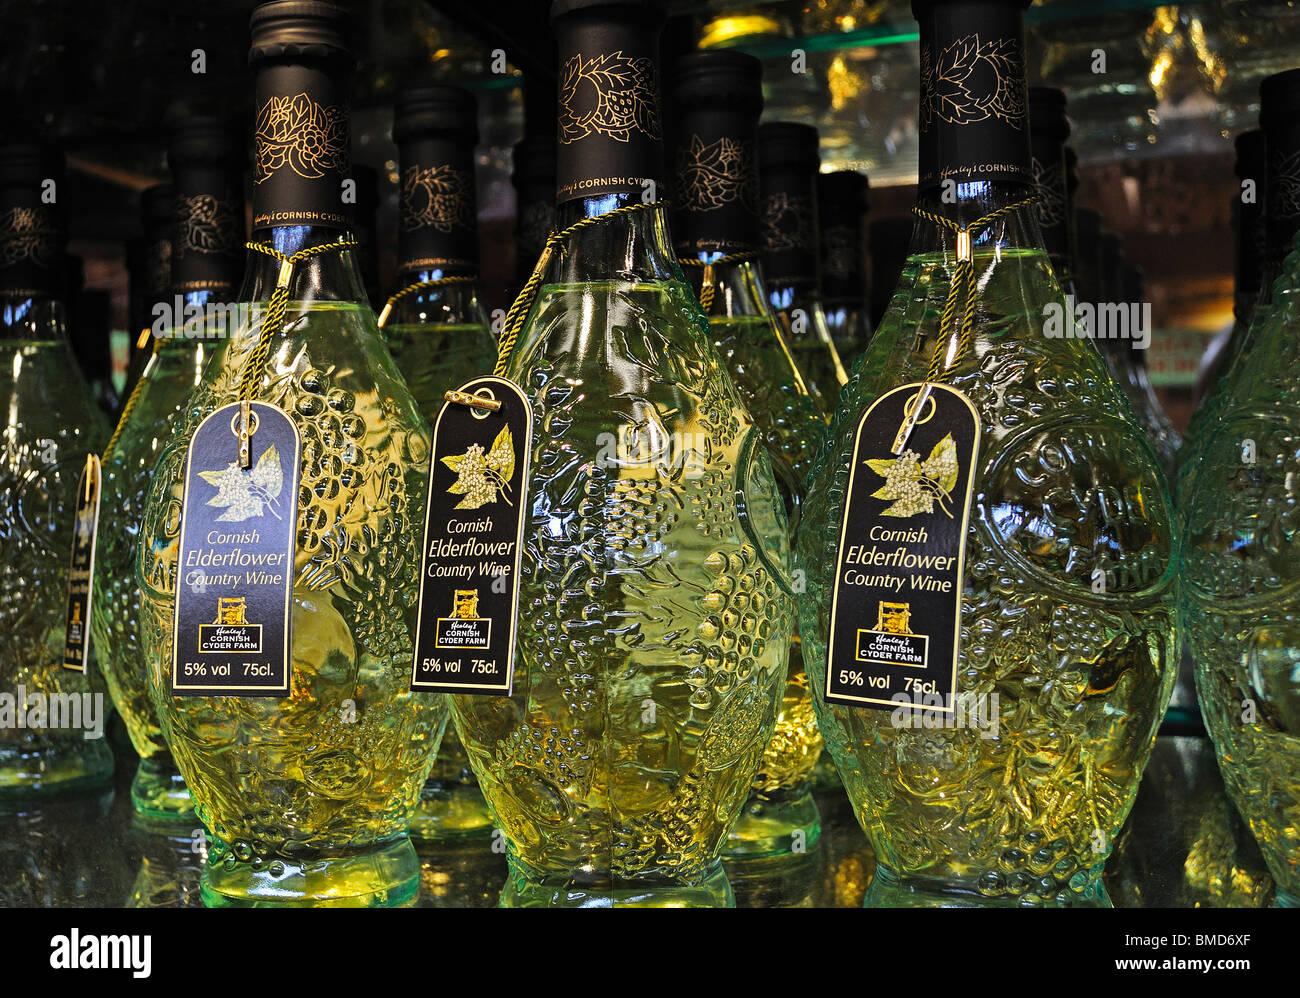 bottles of cornish fruit wine for sale in a farm shop near truro,cornwall,uk - Stock Image